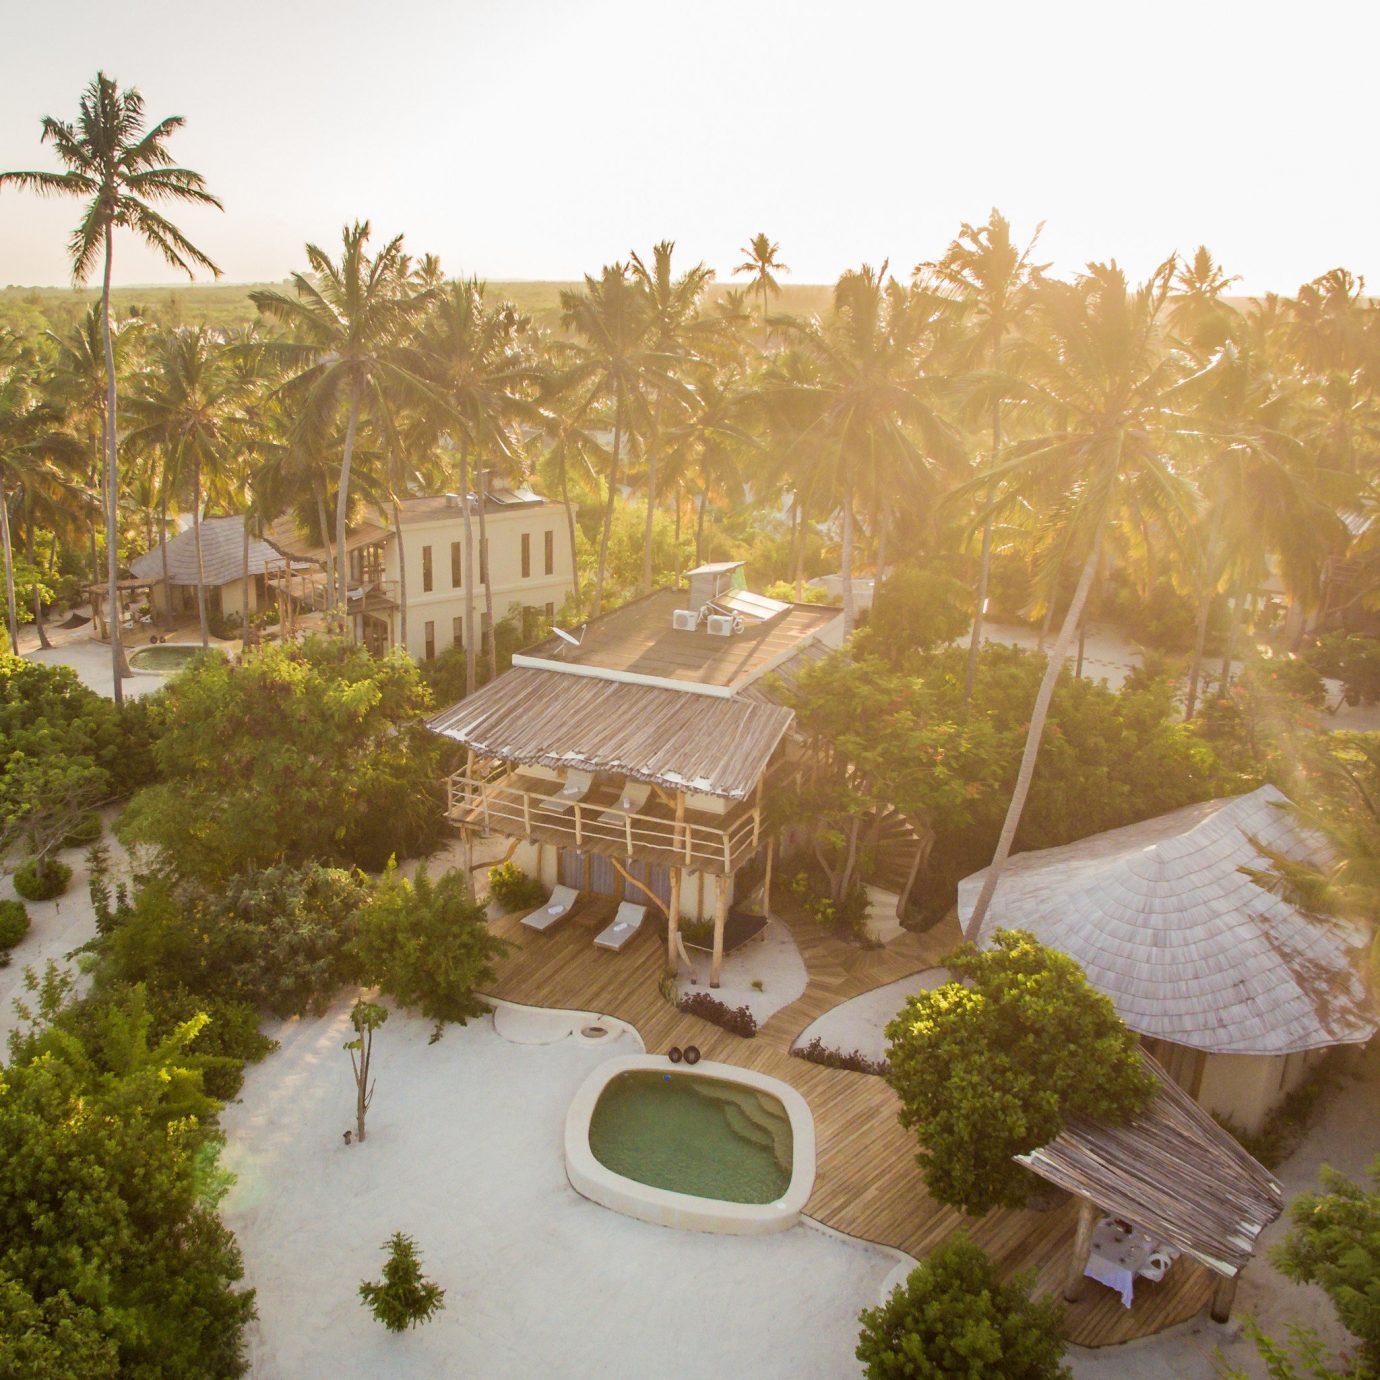 tree sky ecosystem rural area agriculture Resort Village mansion Jungle plant